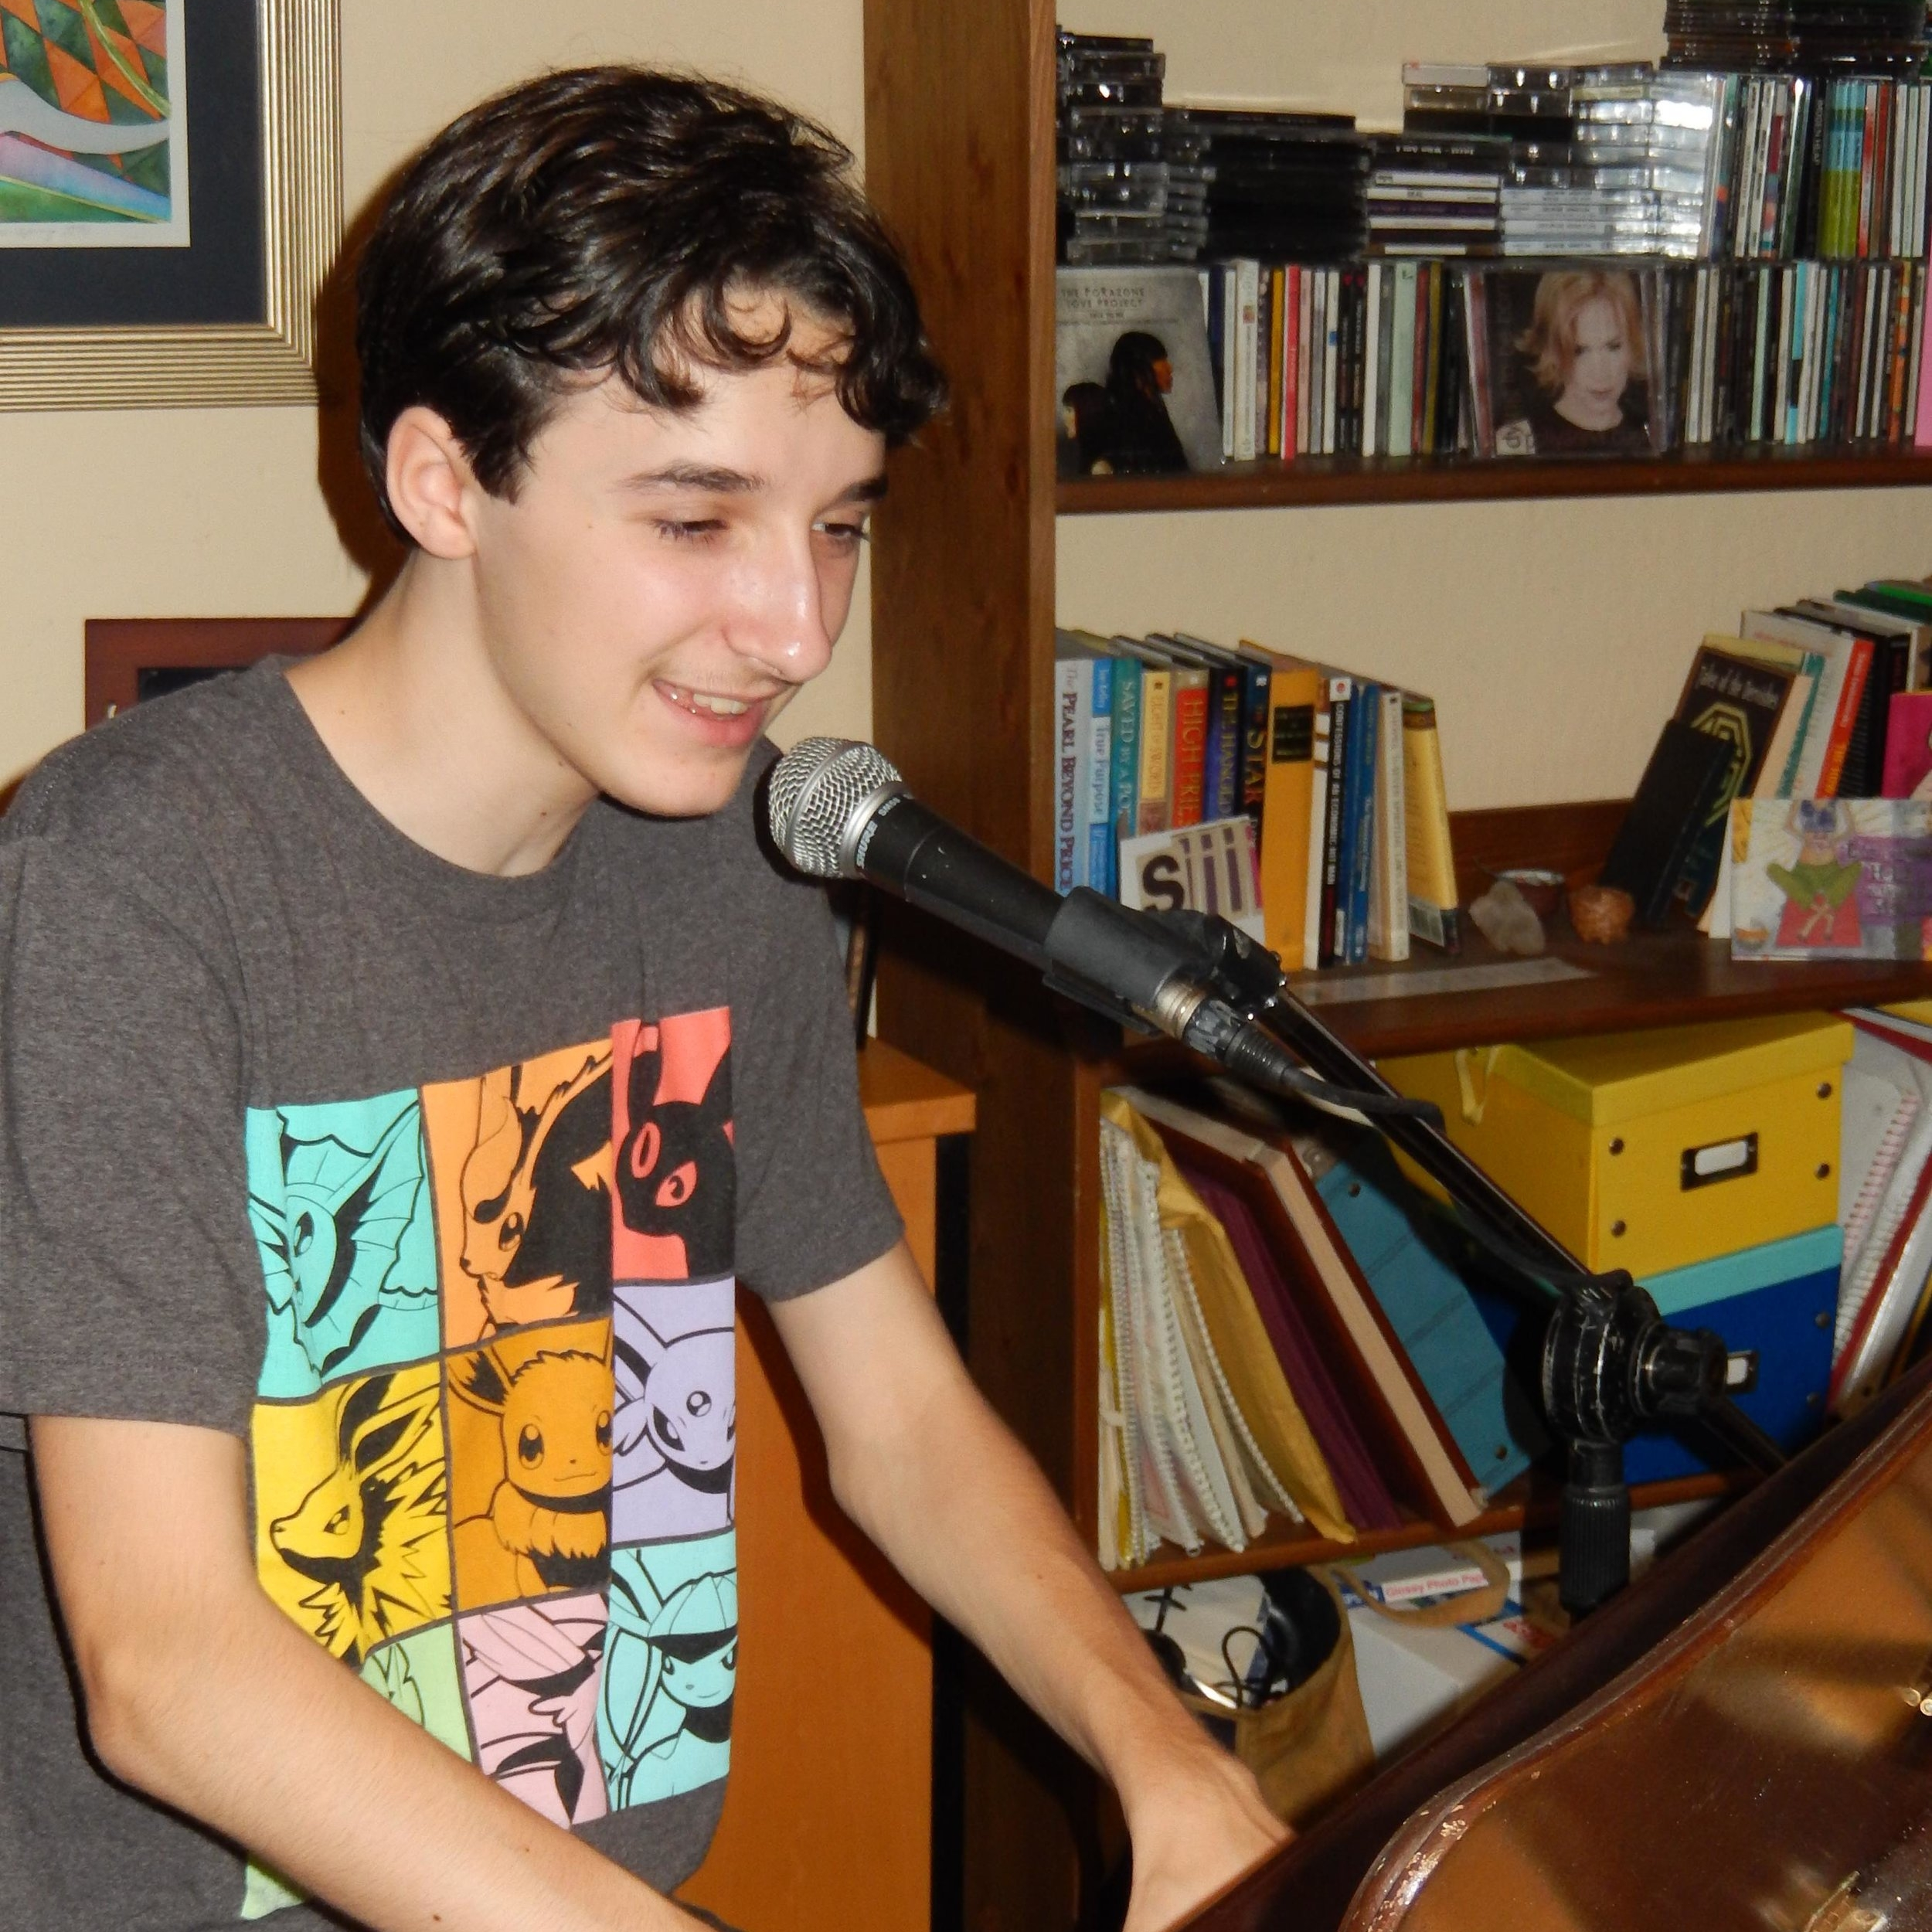 MICHAEL ROBERTSON |  15 Years Old